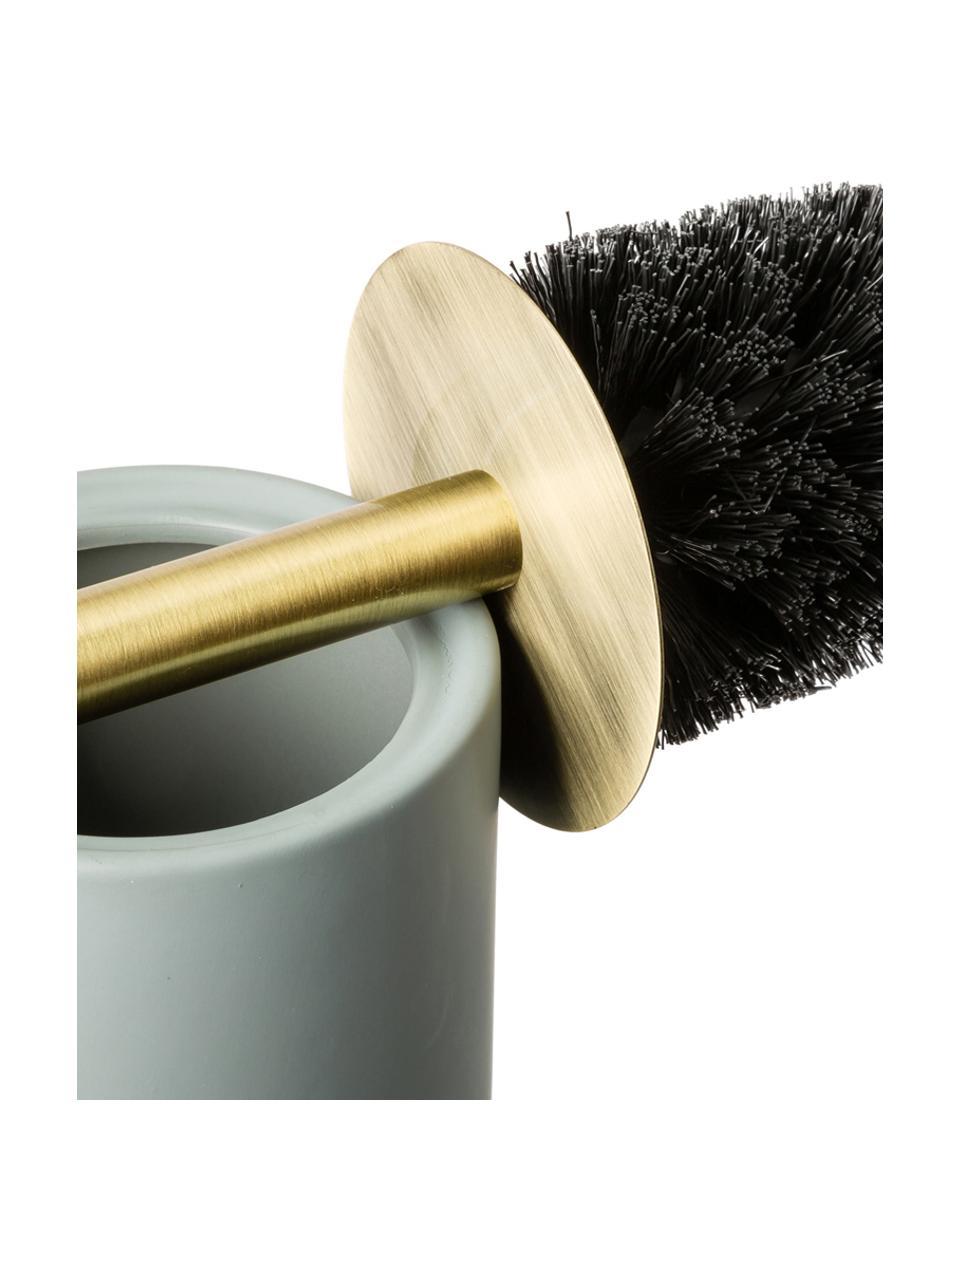 Toilettenbürste Lotus mit Keramik-Behälter, Behälter: Keramik, Griff: Metall, Grün, Messingfarben, Schwarz, Ø 10 x H 21 cm